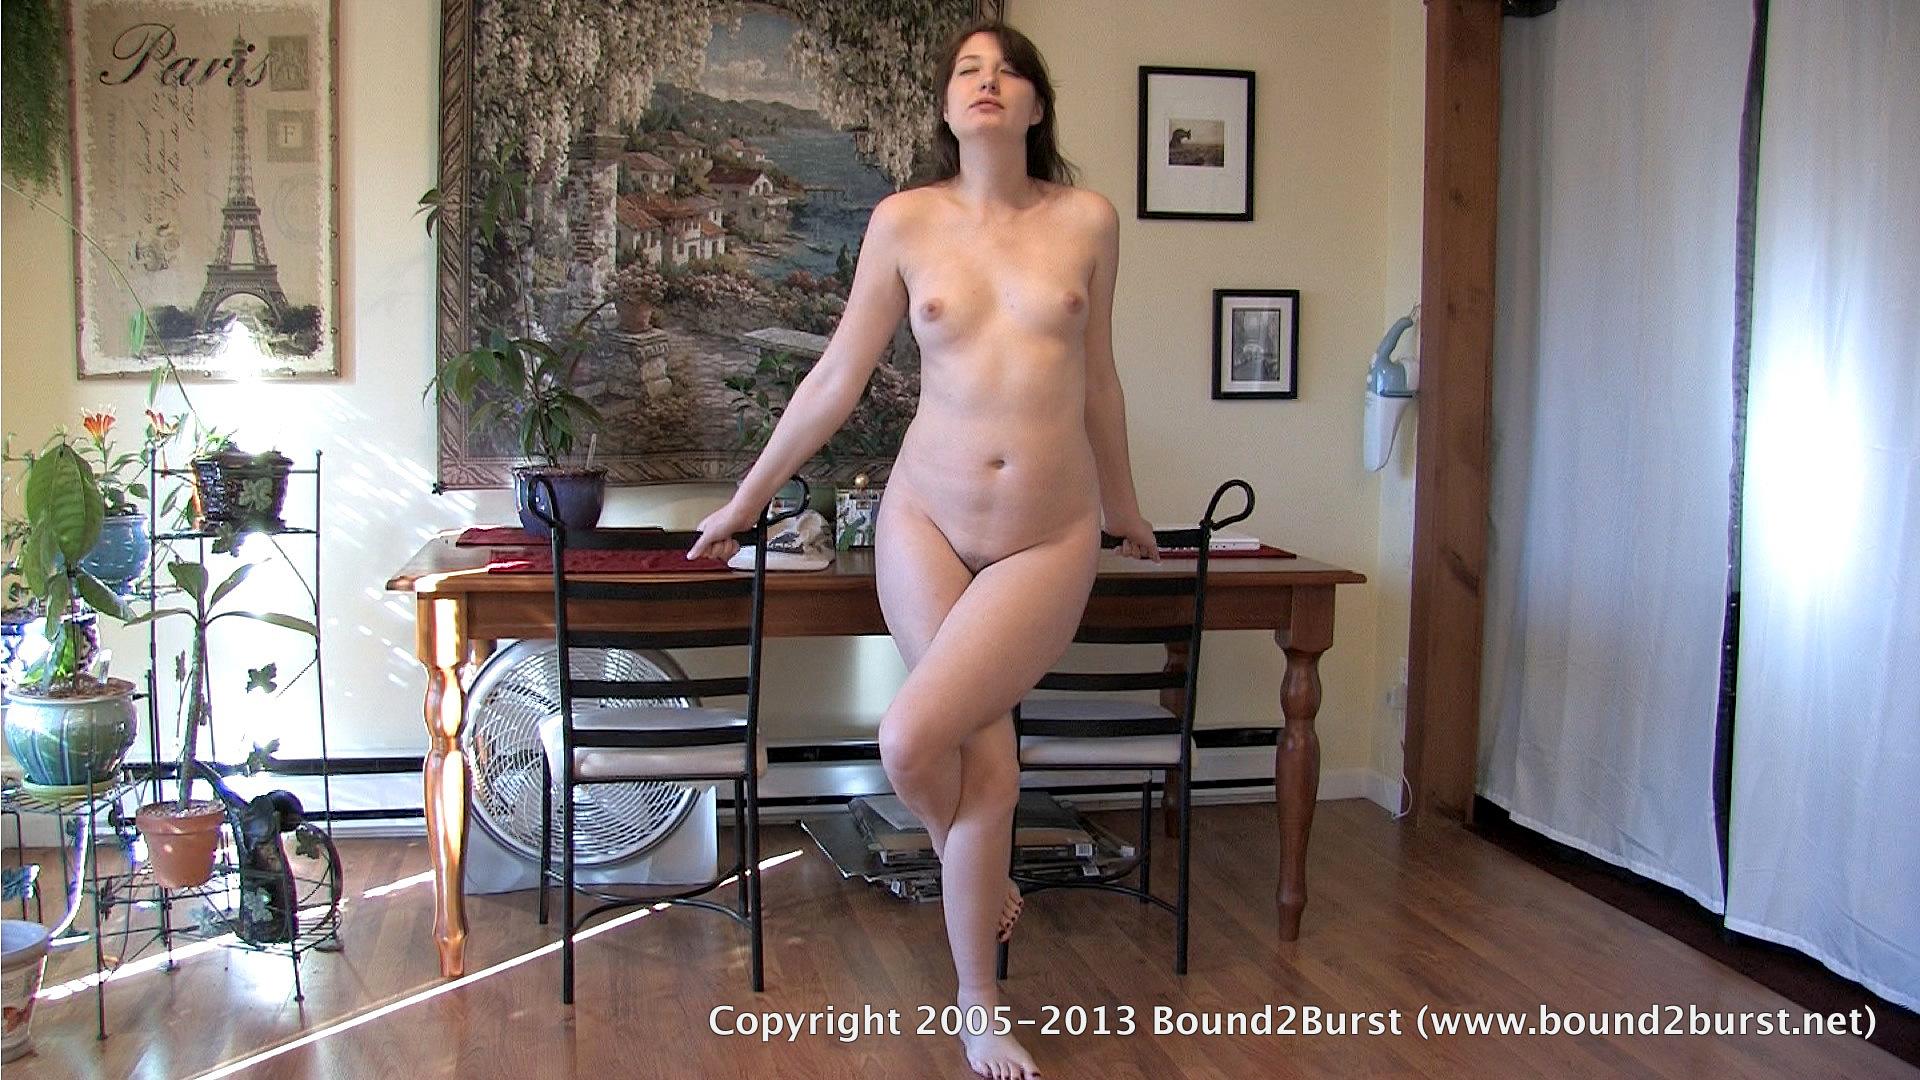 All Joleyn Burst Free Nude Pictures Galleries